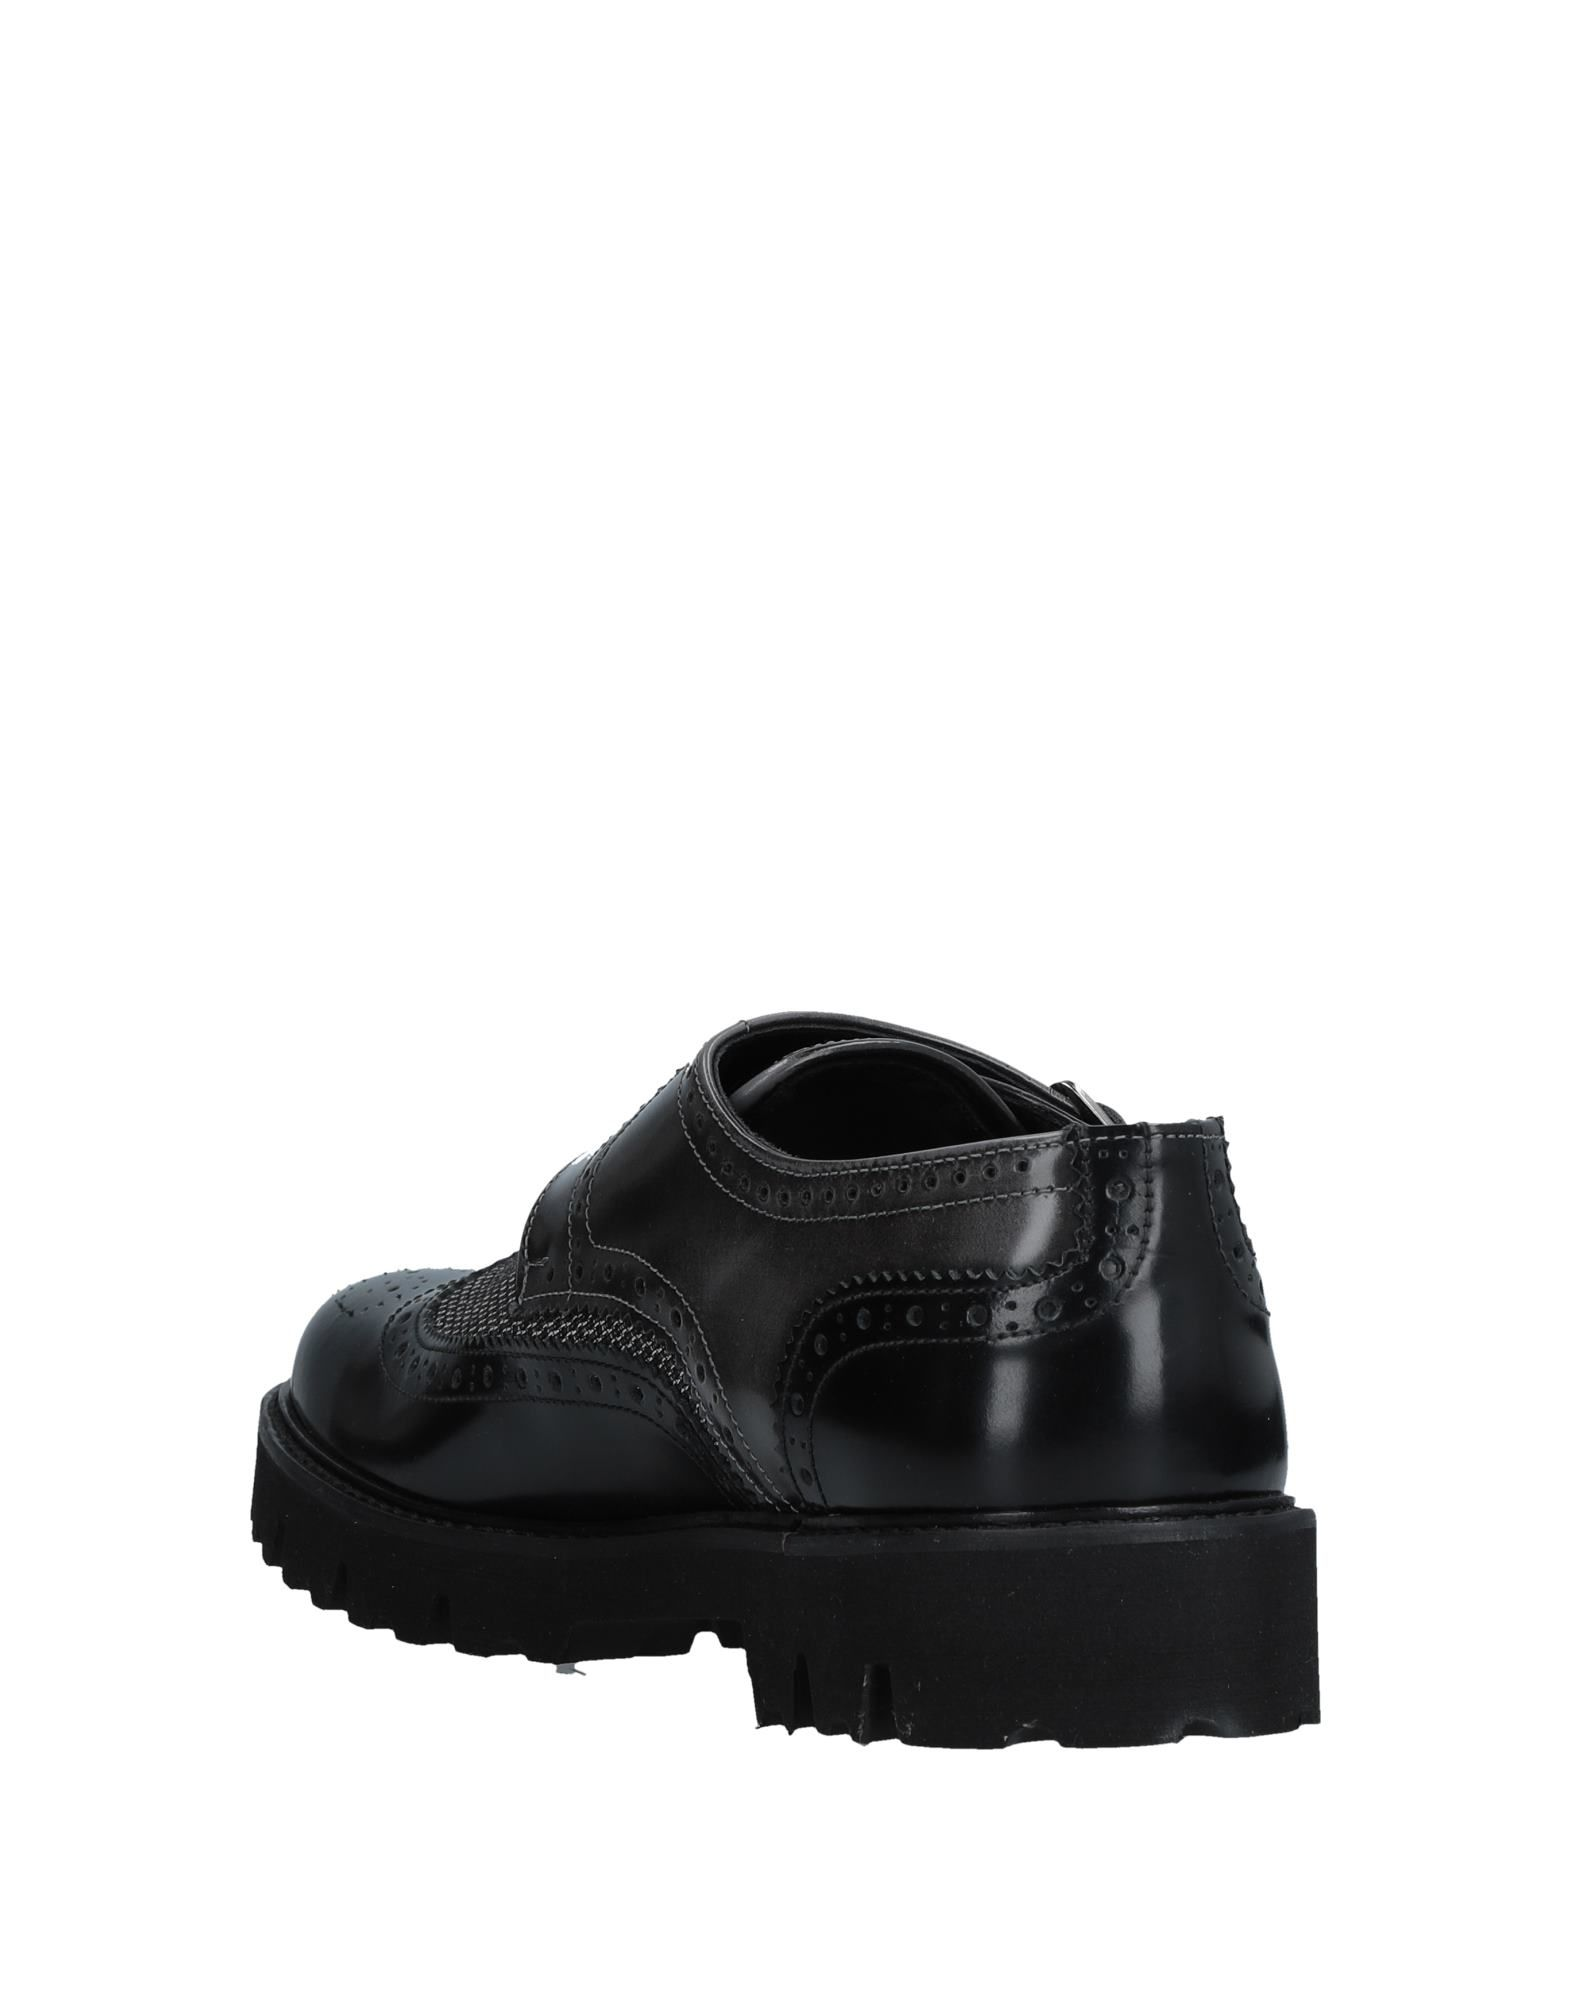 Bottega Marchigiana Gute Mokassins Herren  11542351WP Gute Marchigiana Qualität beliebte Schuhe bf1784